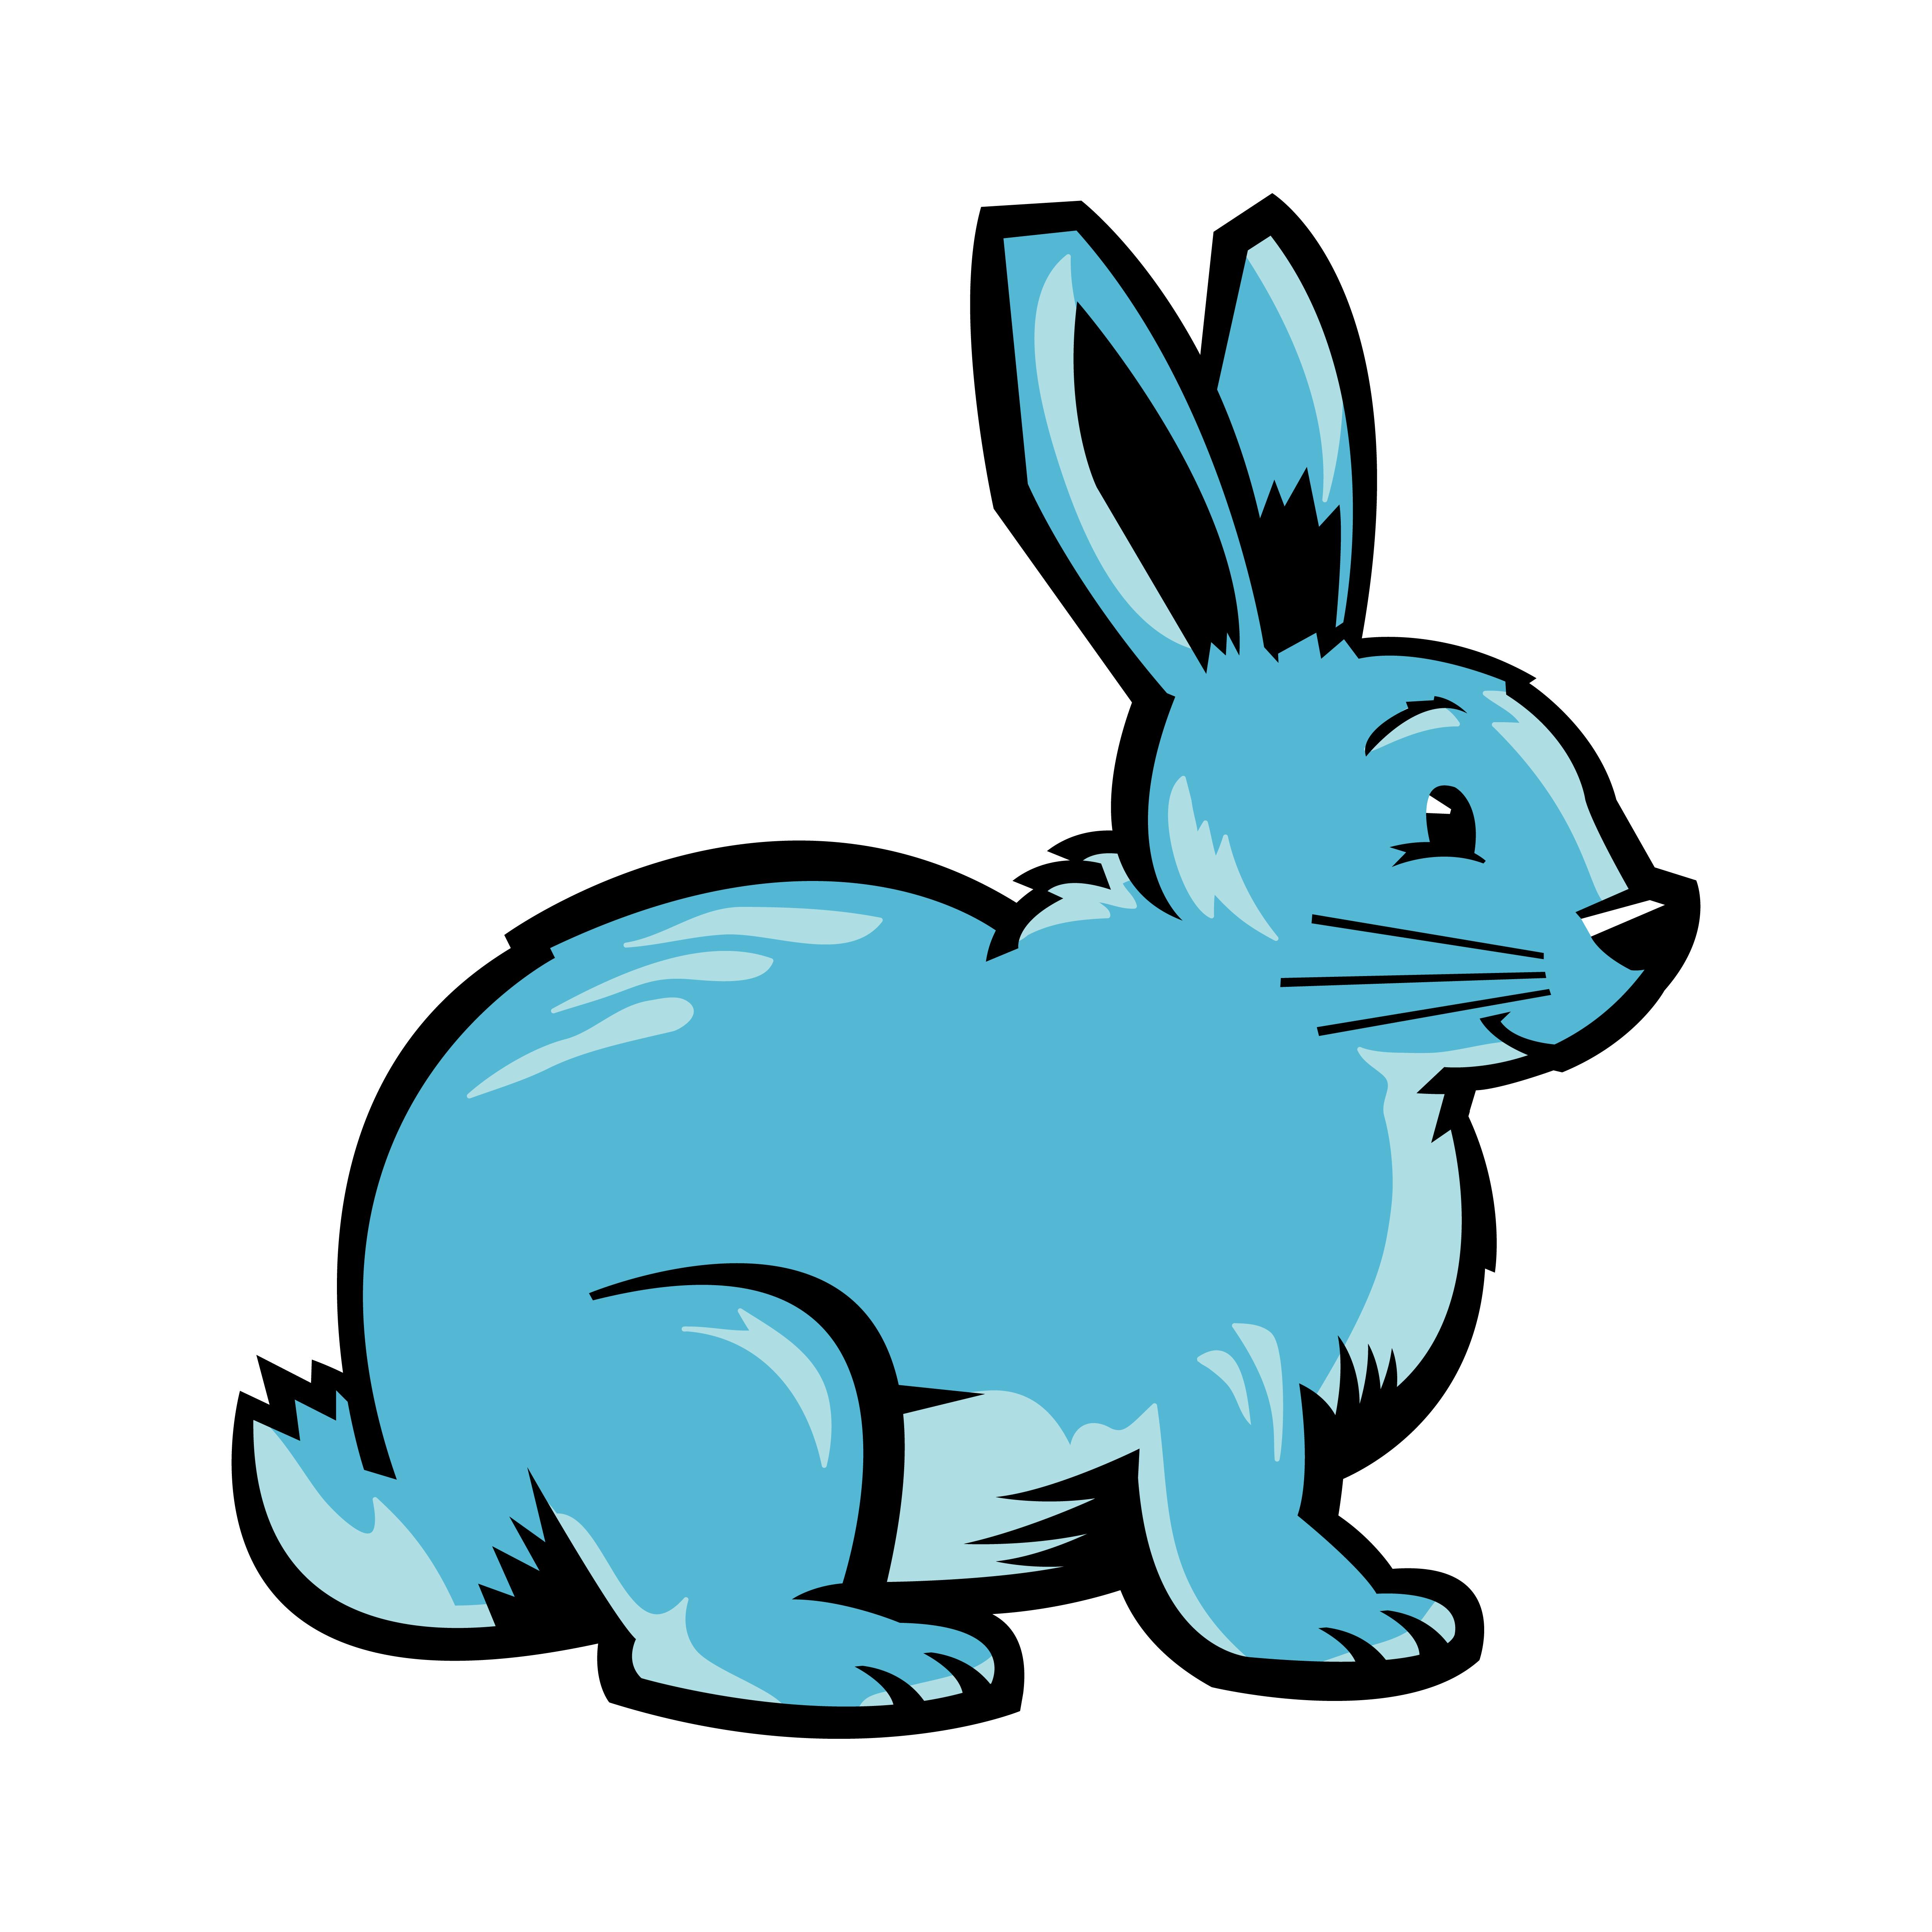 Cartoon Bunny Rabbit Graphic Download Free Vectors